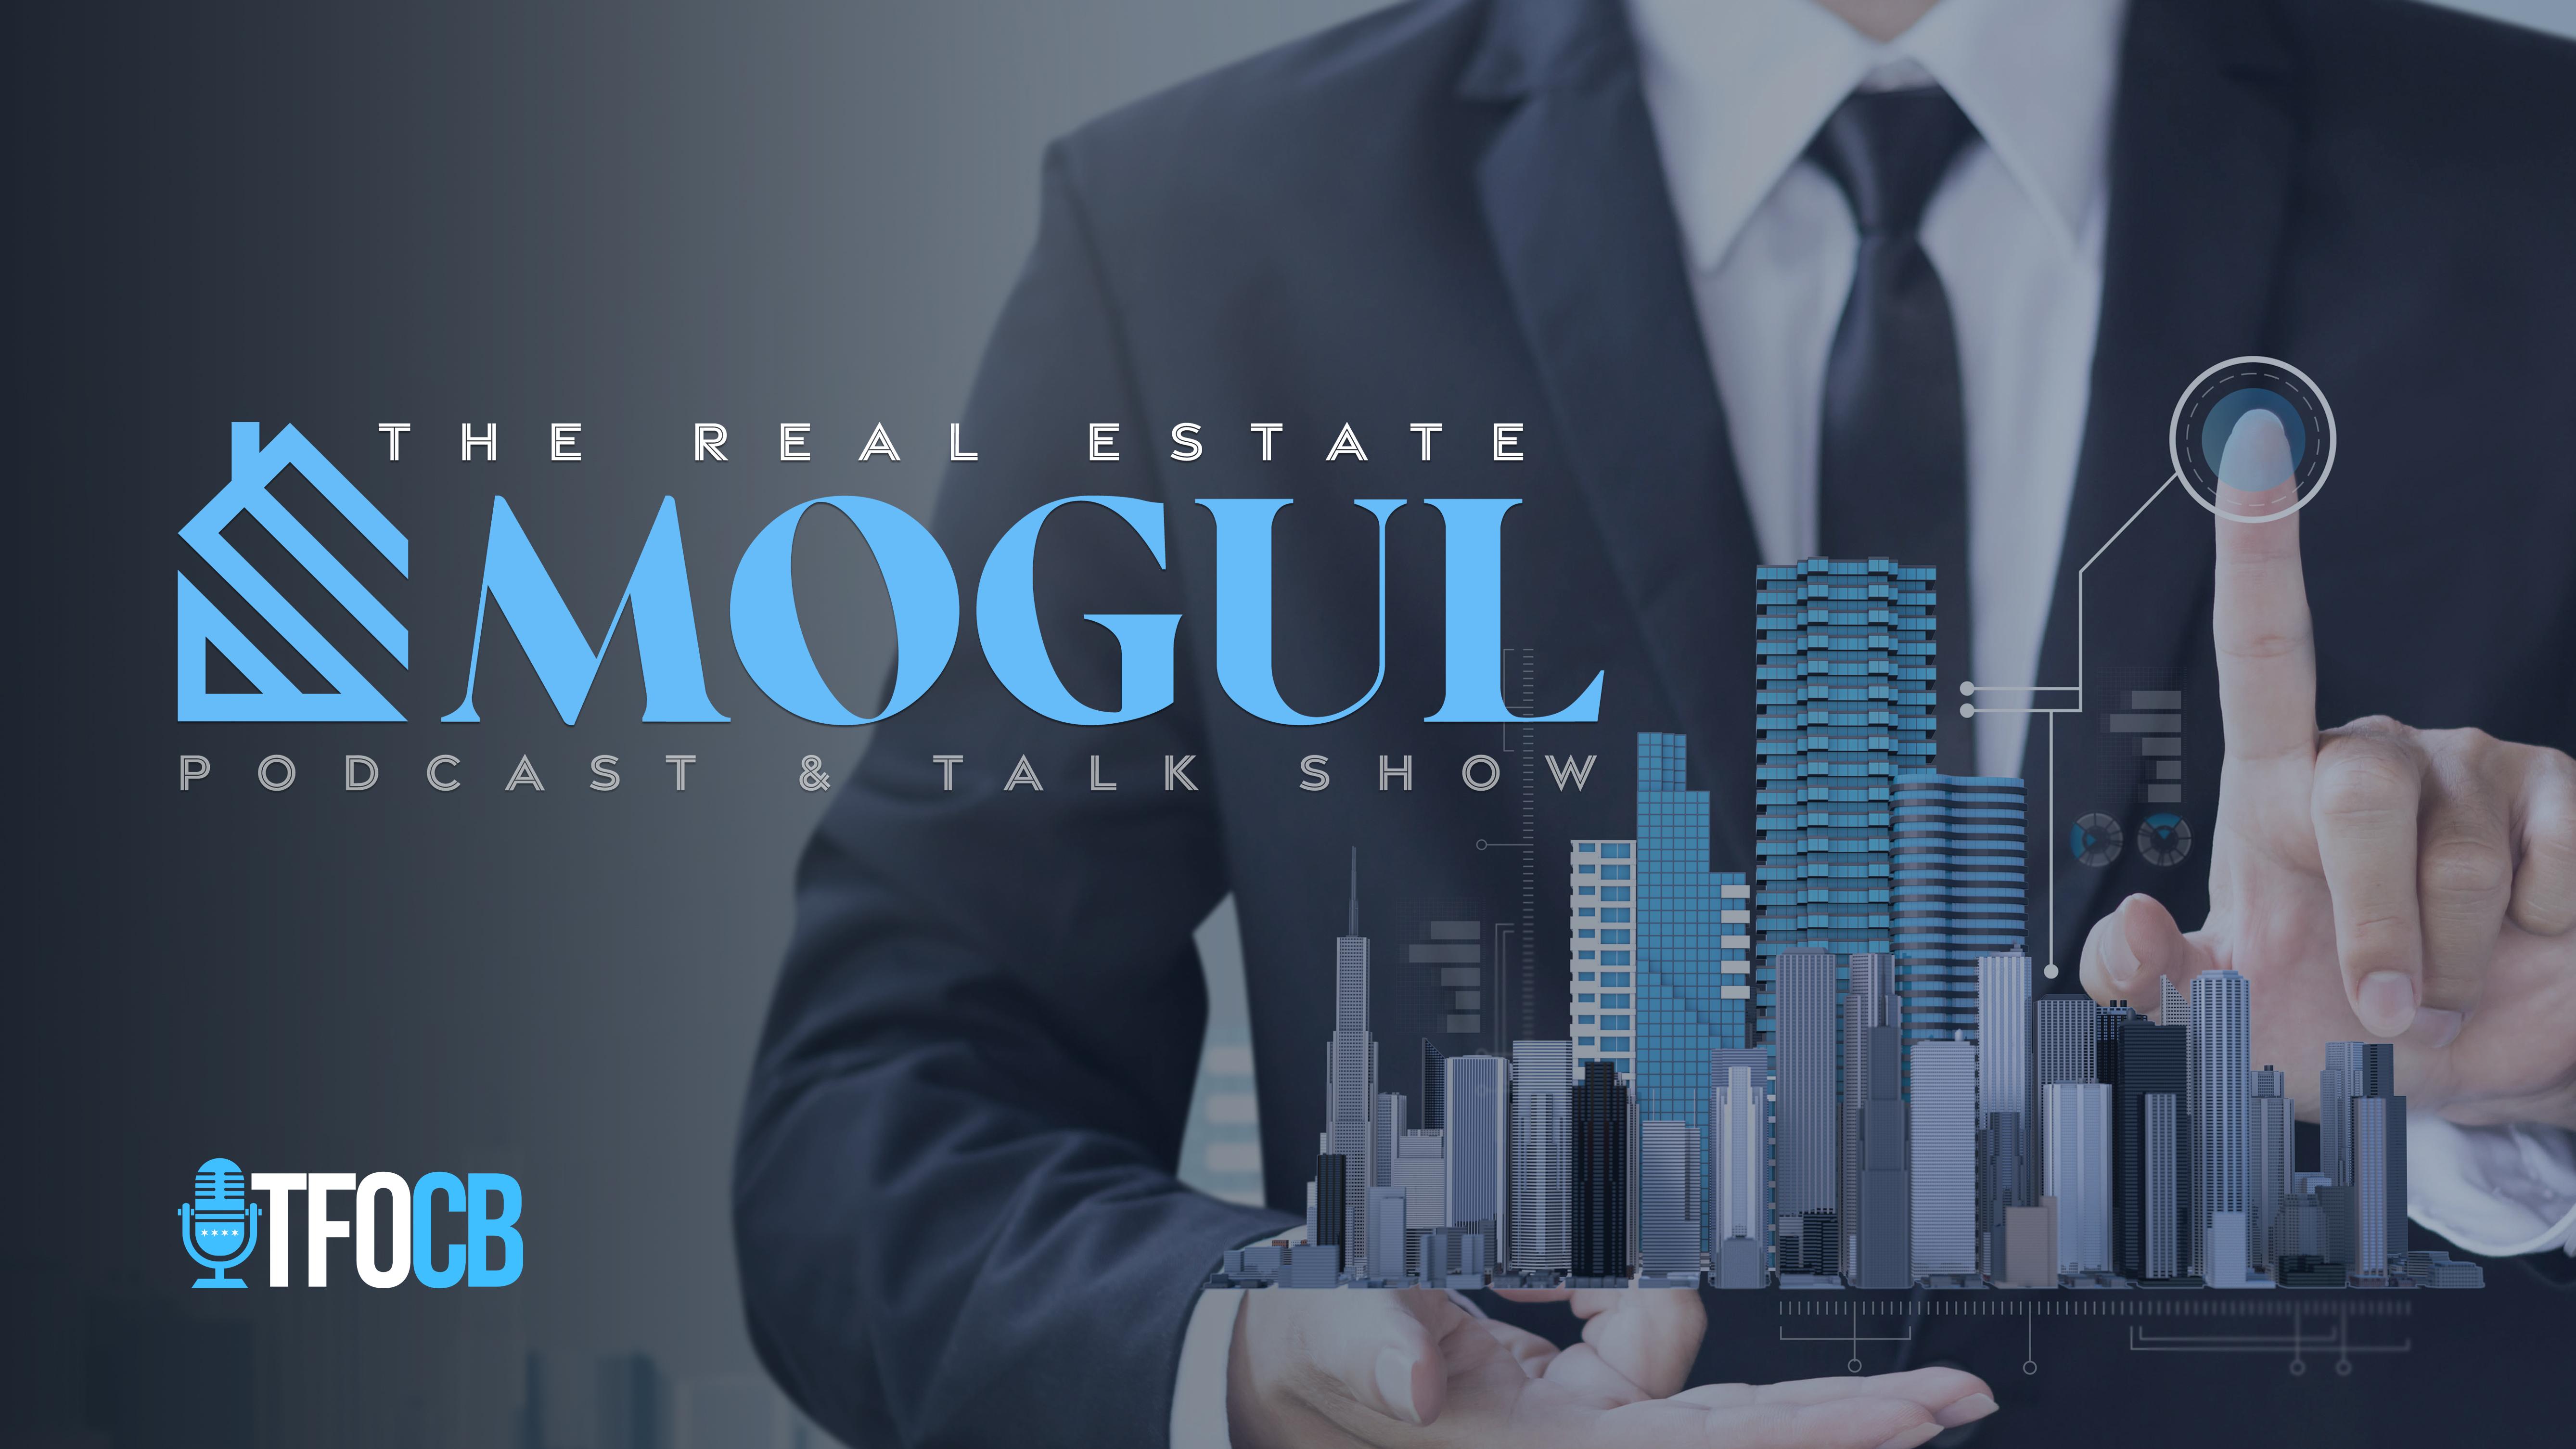 reael estate mogul podcast and talk show